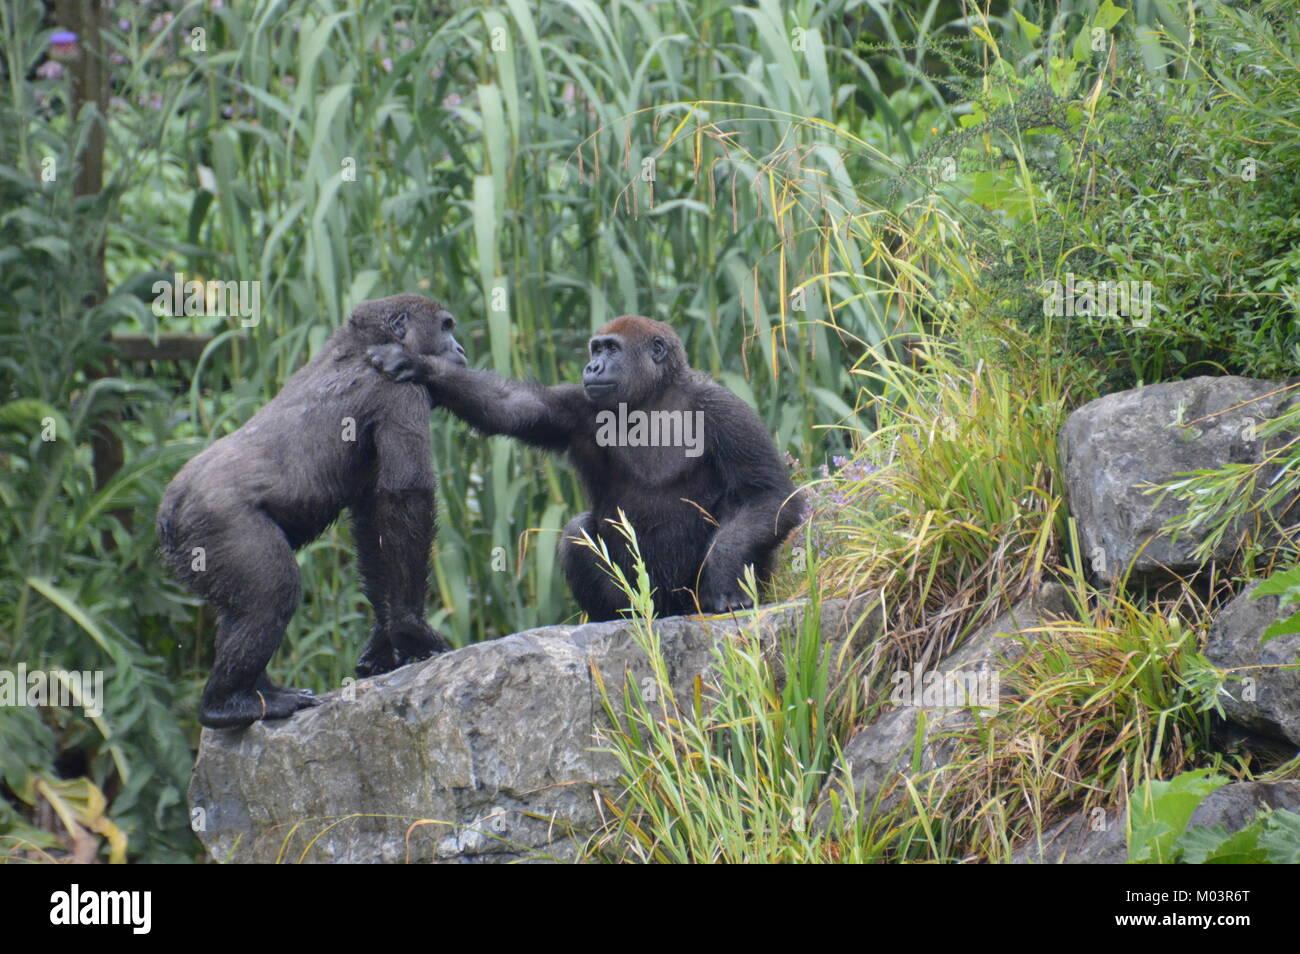 Gorillas Gorillas Gorillas - Stock Image